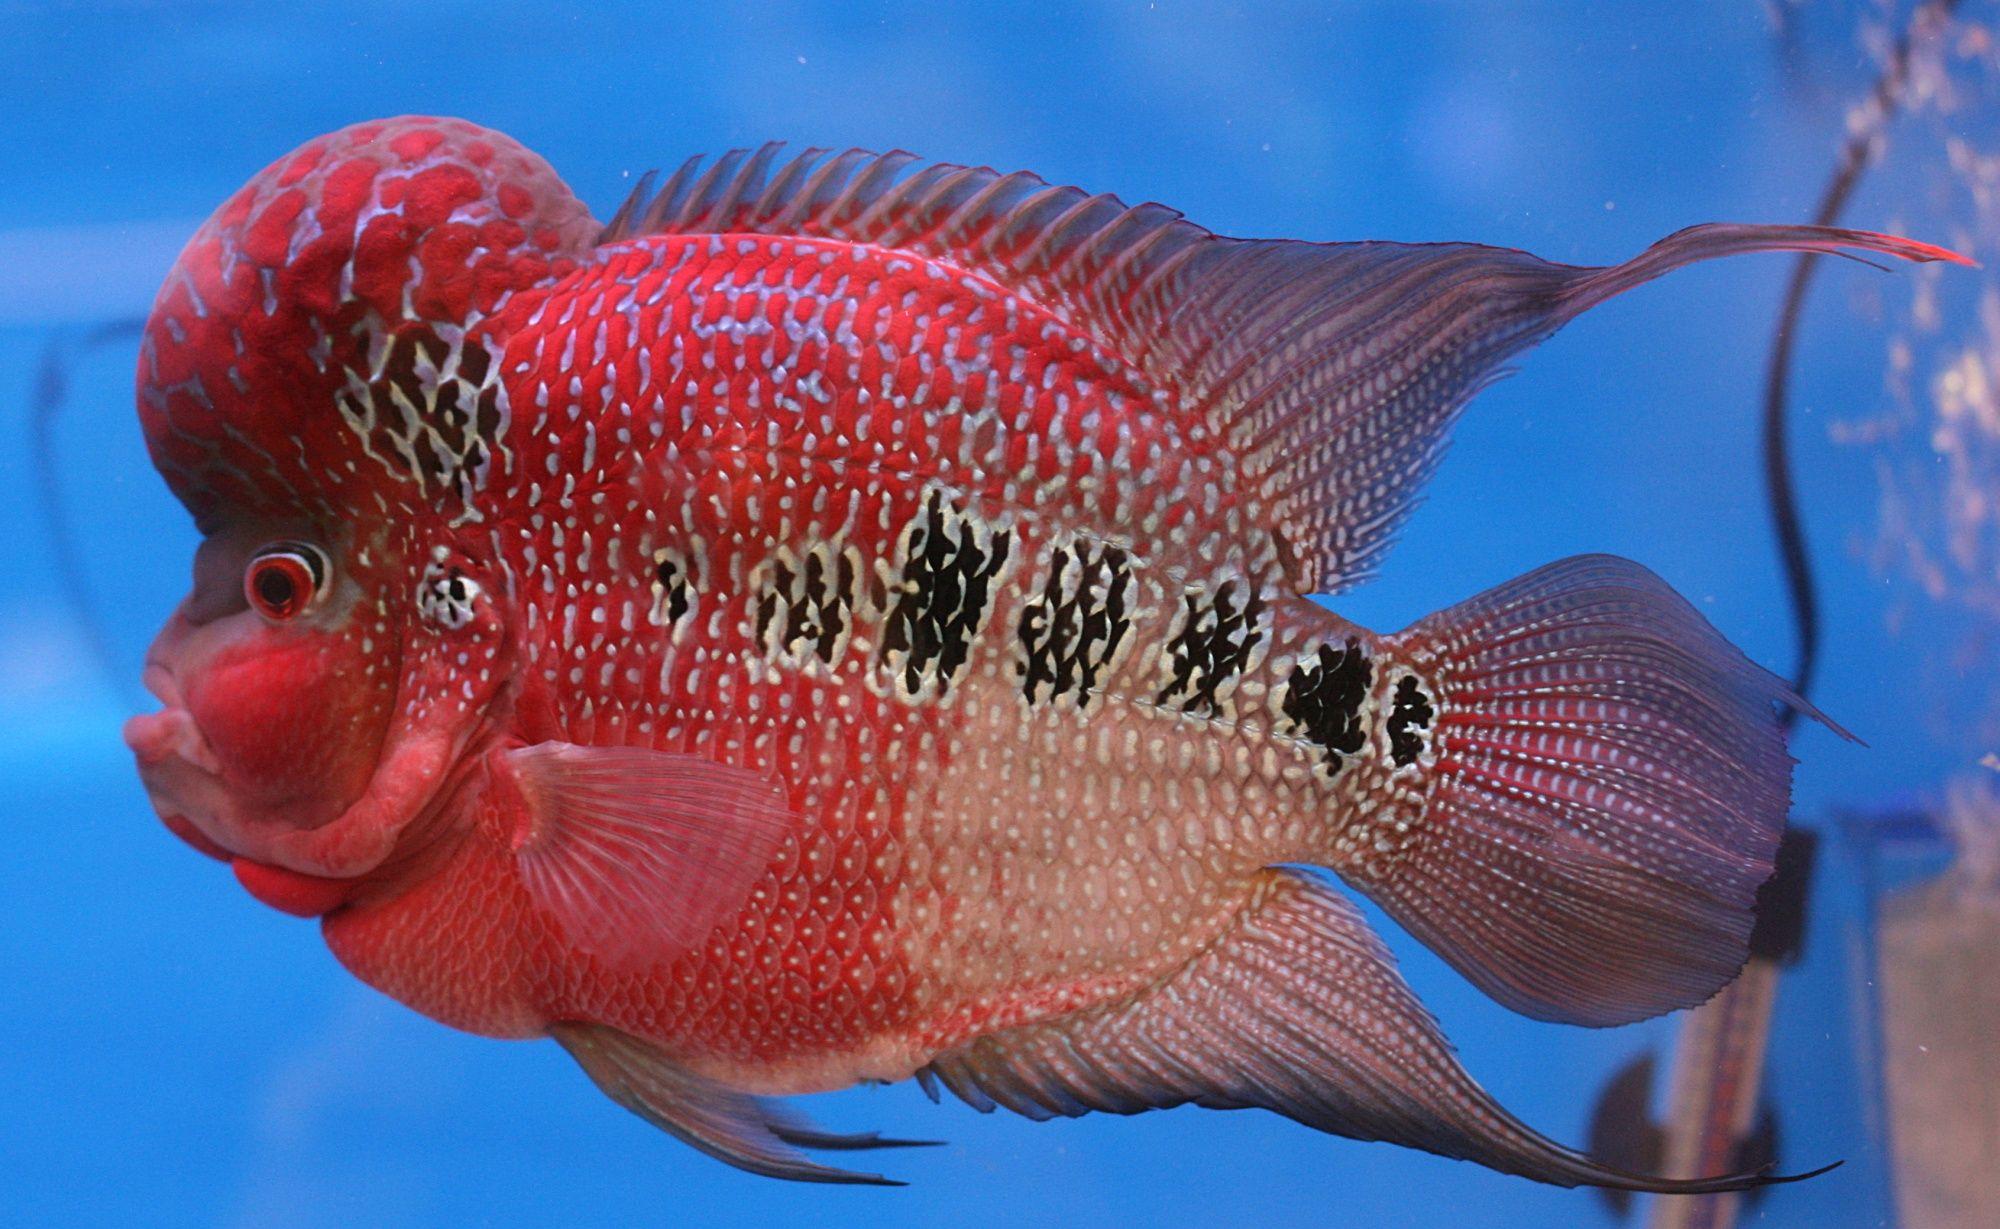 Freshwater aquarium fish jacksonville fl - Fish